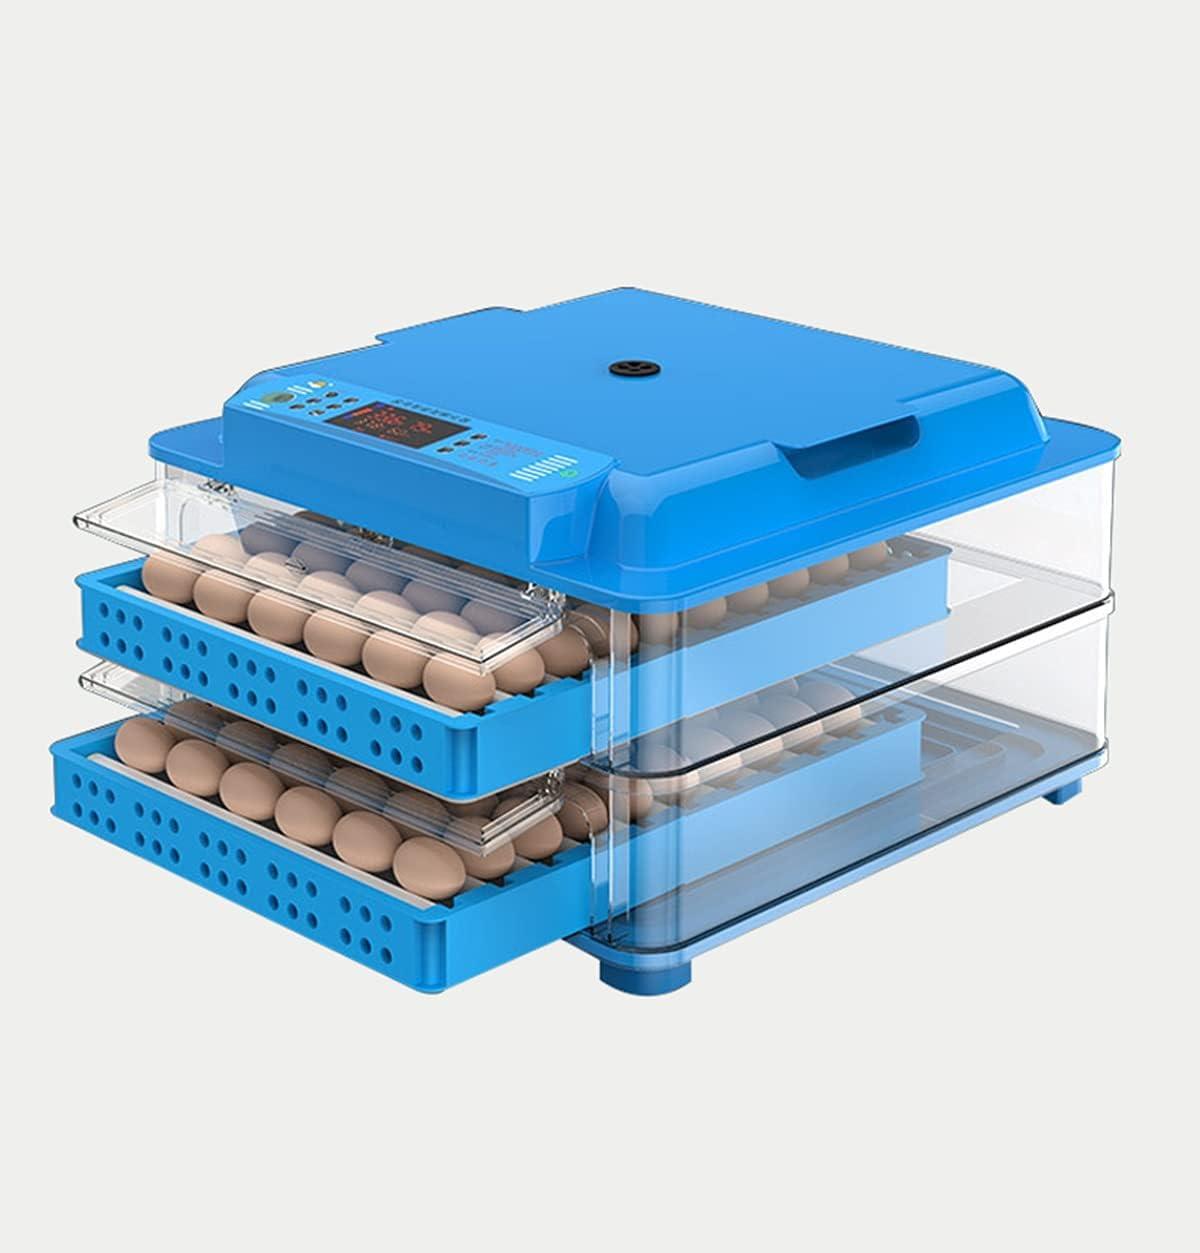 YAWEDA Cheap Egg Max 55% OFF Incubator Automatic with Eggs 128 Temperatu